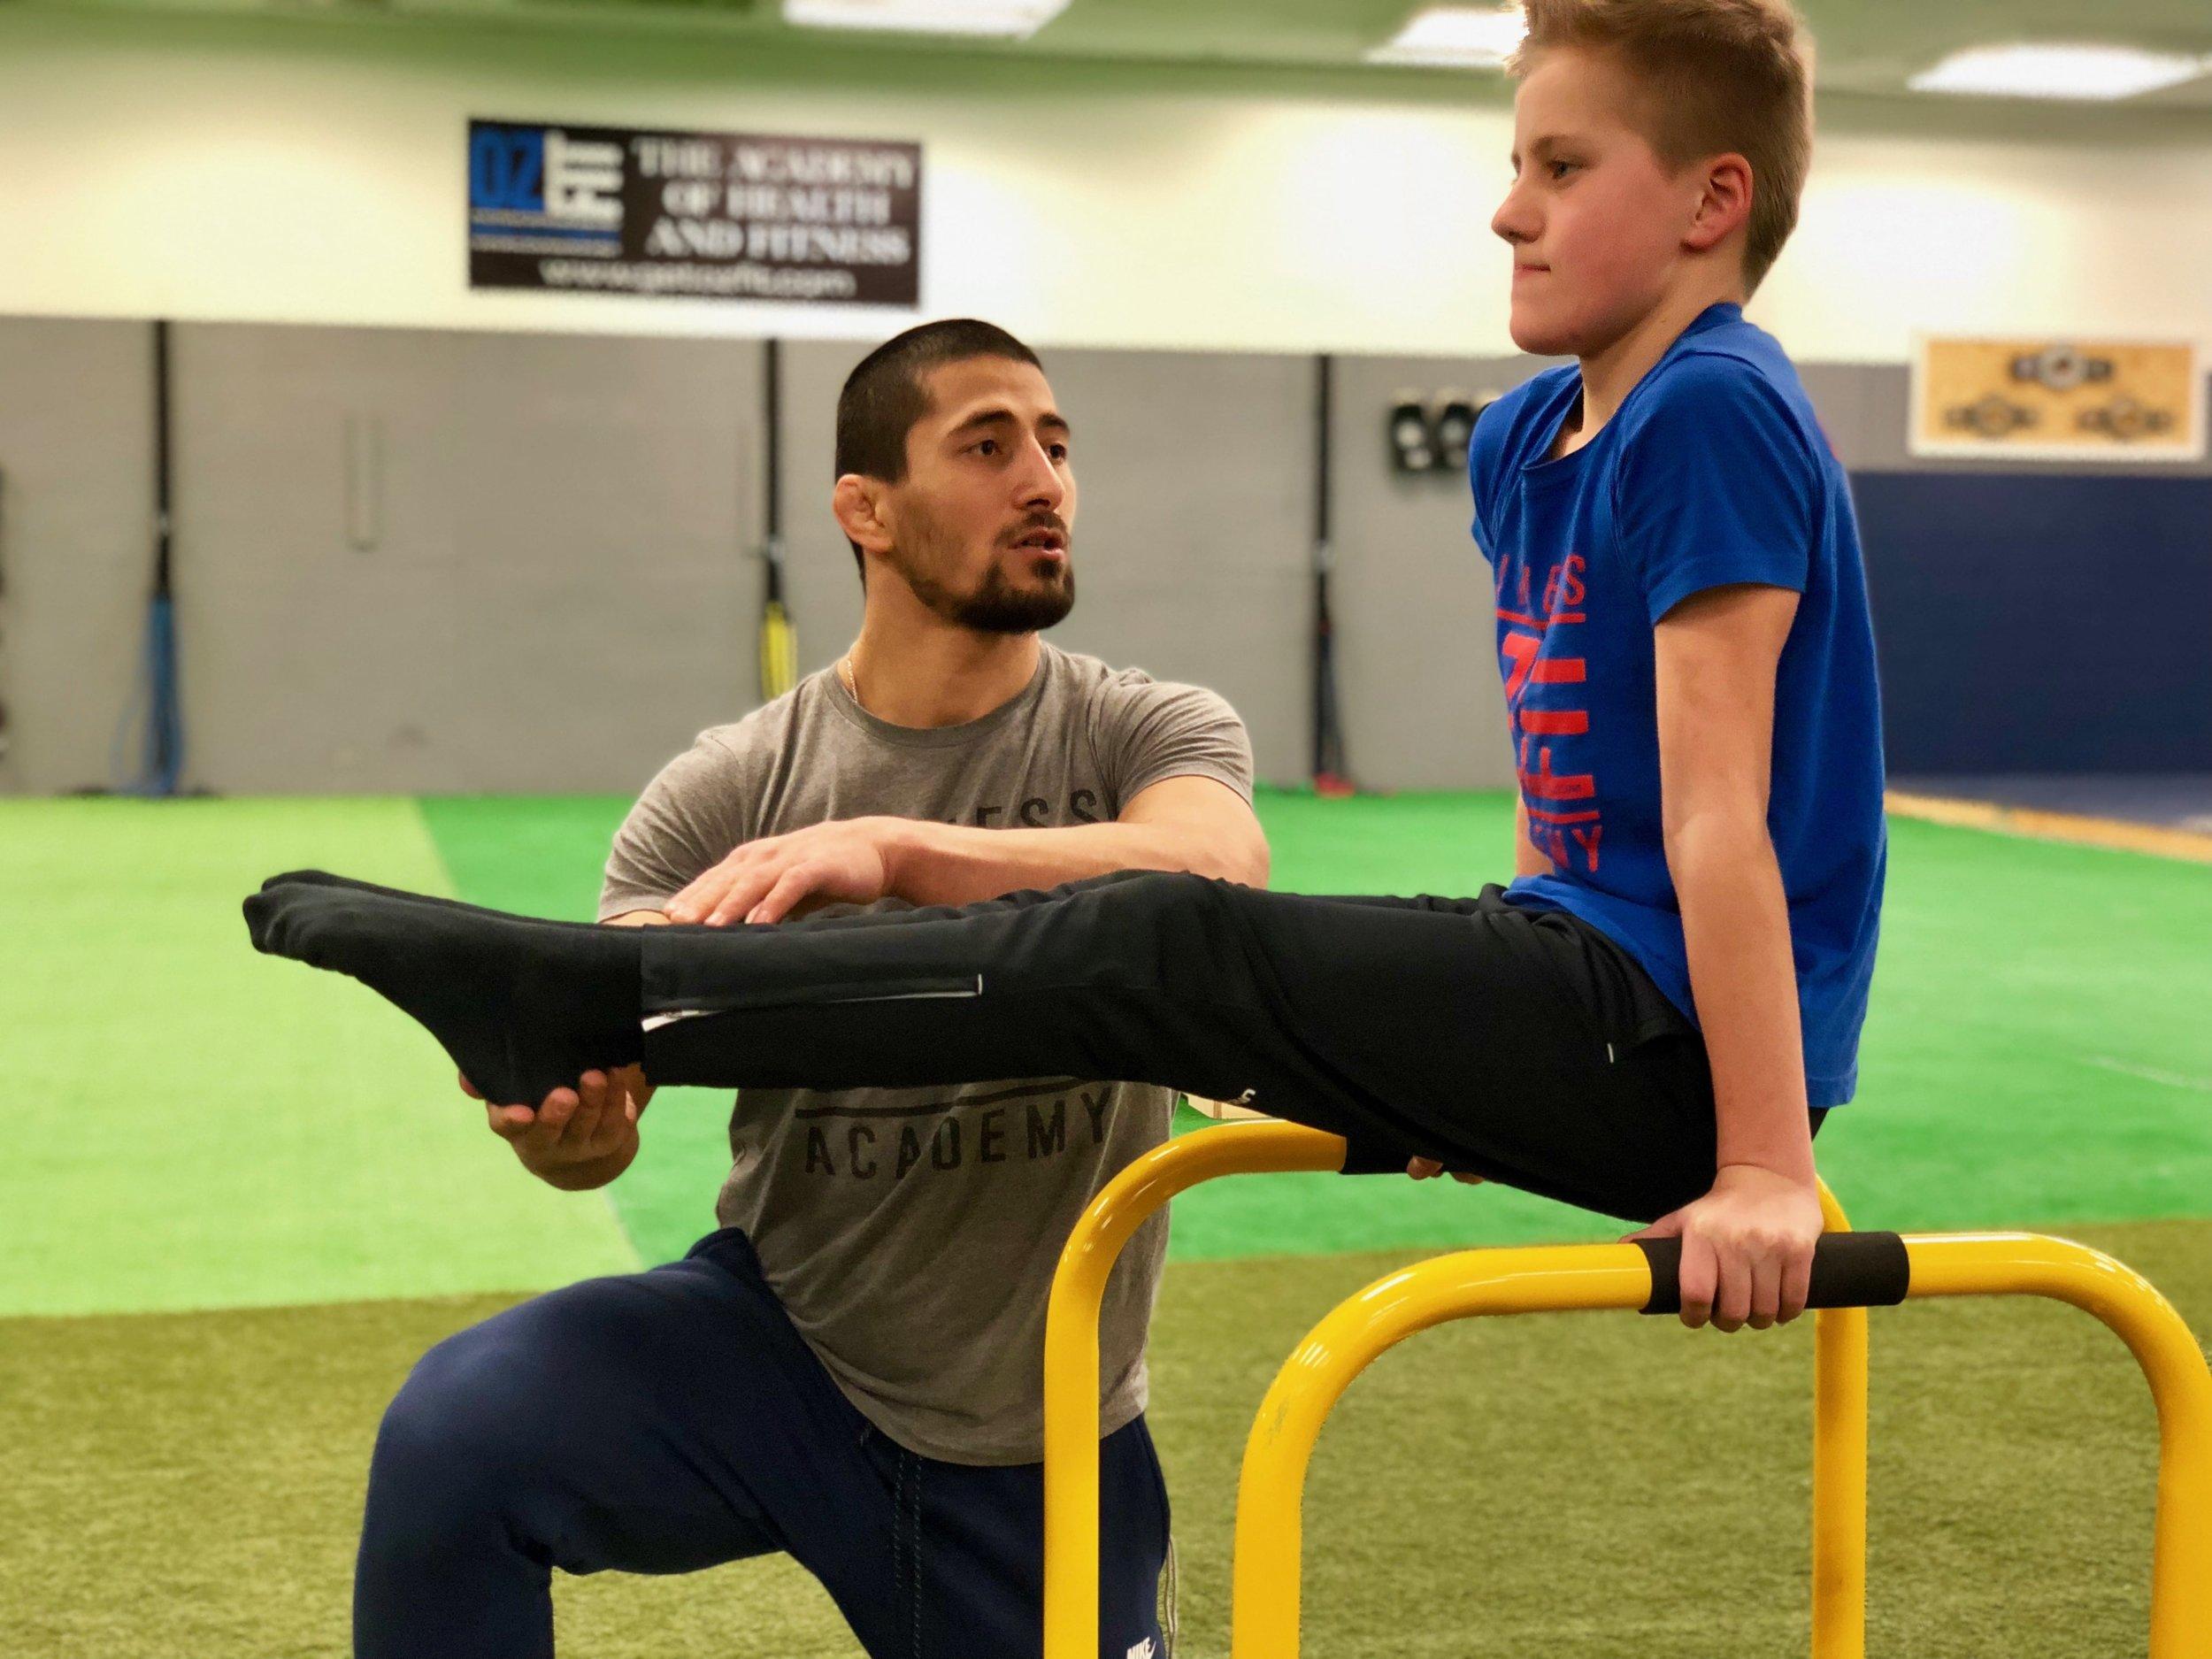 Get Oz Fit - Personal Trainer in Bergen County New Jersey - Ozzy Dugulubgov - Kids Training - Youth Fitness Program NJ (2)-min.jpeg